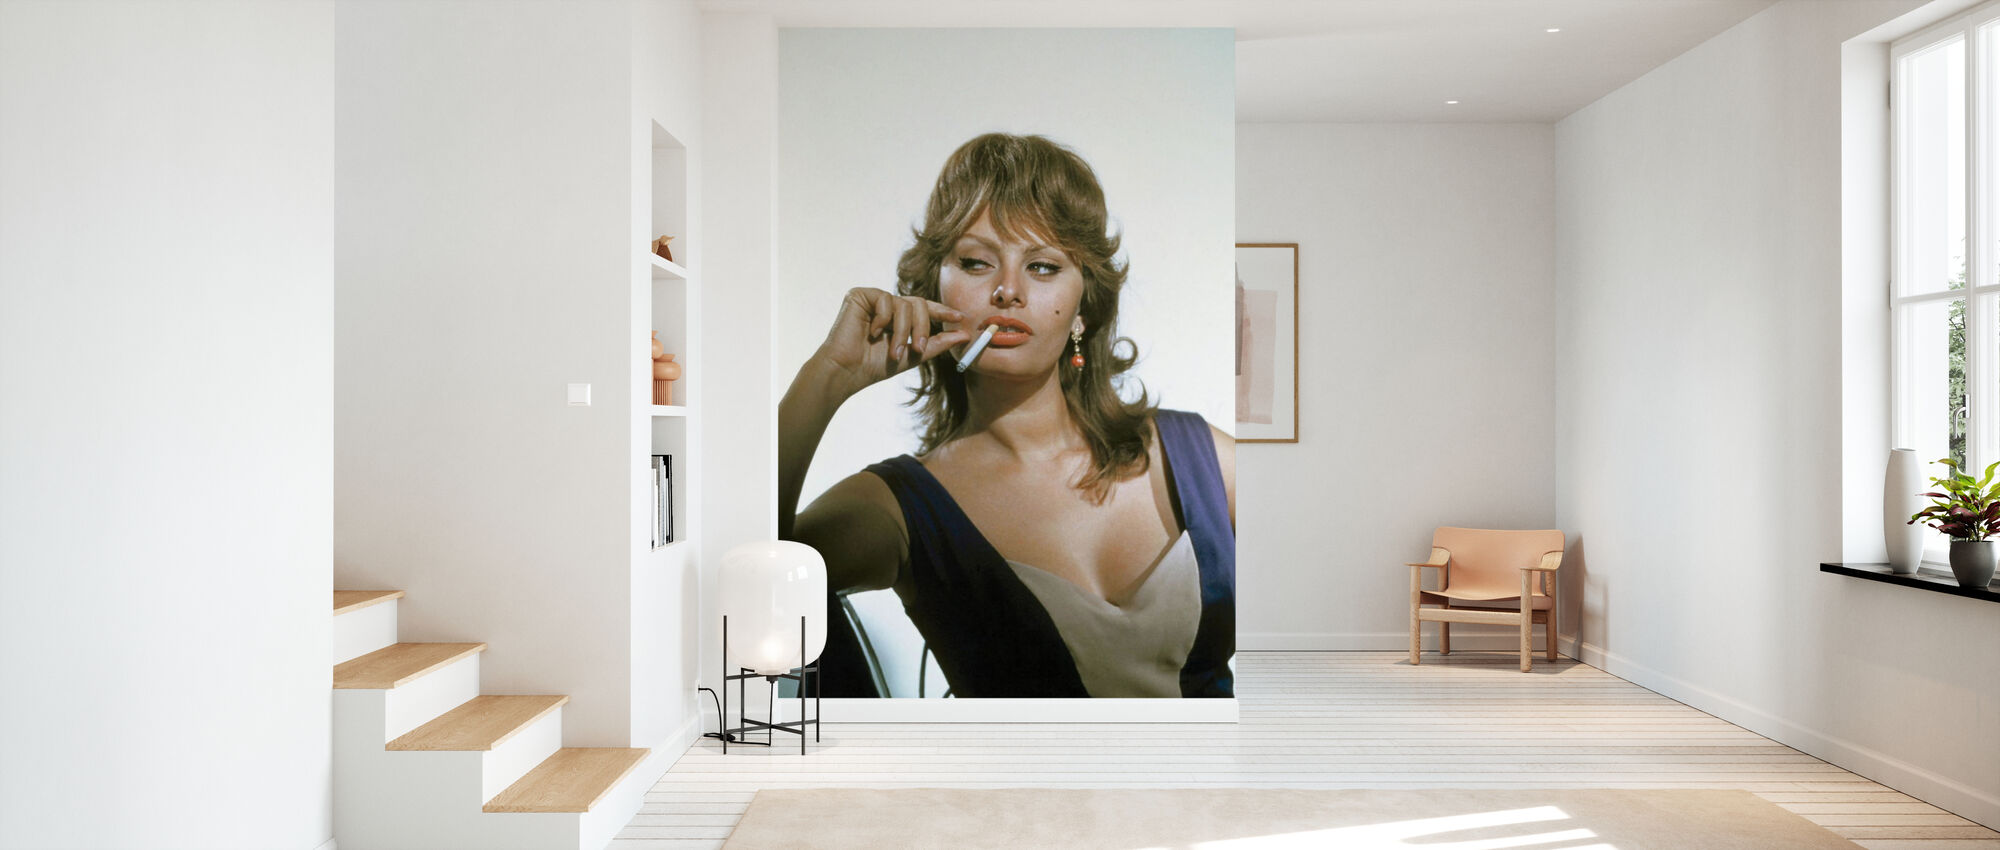 Sophia Loren - Tapete - Flur